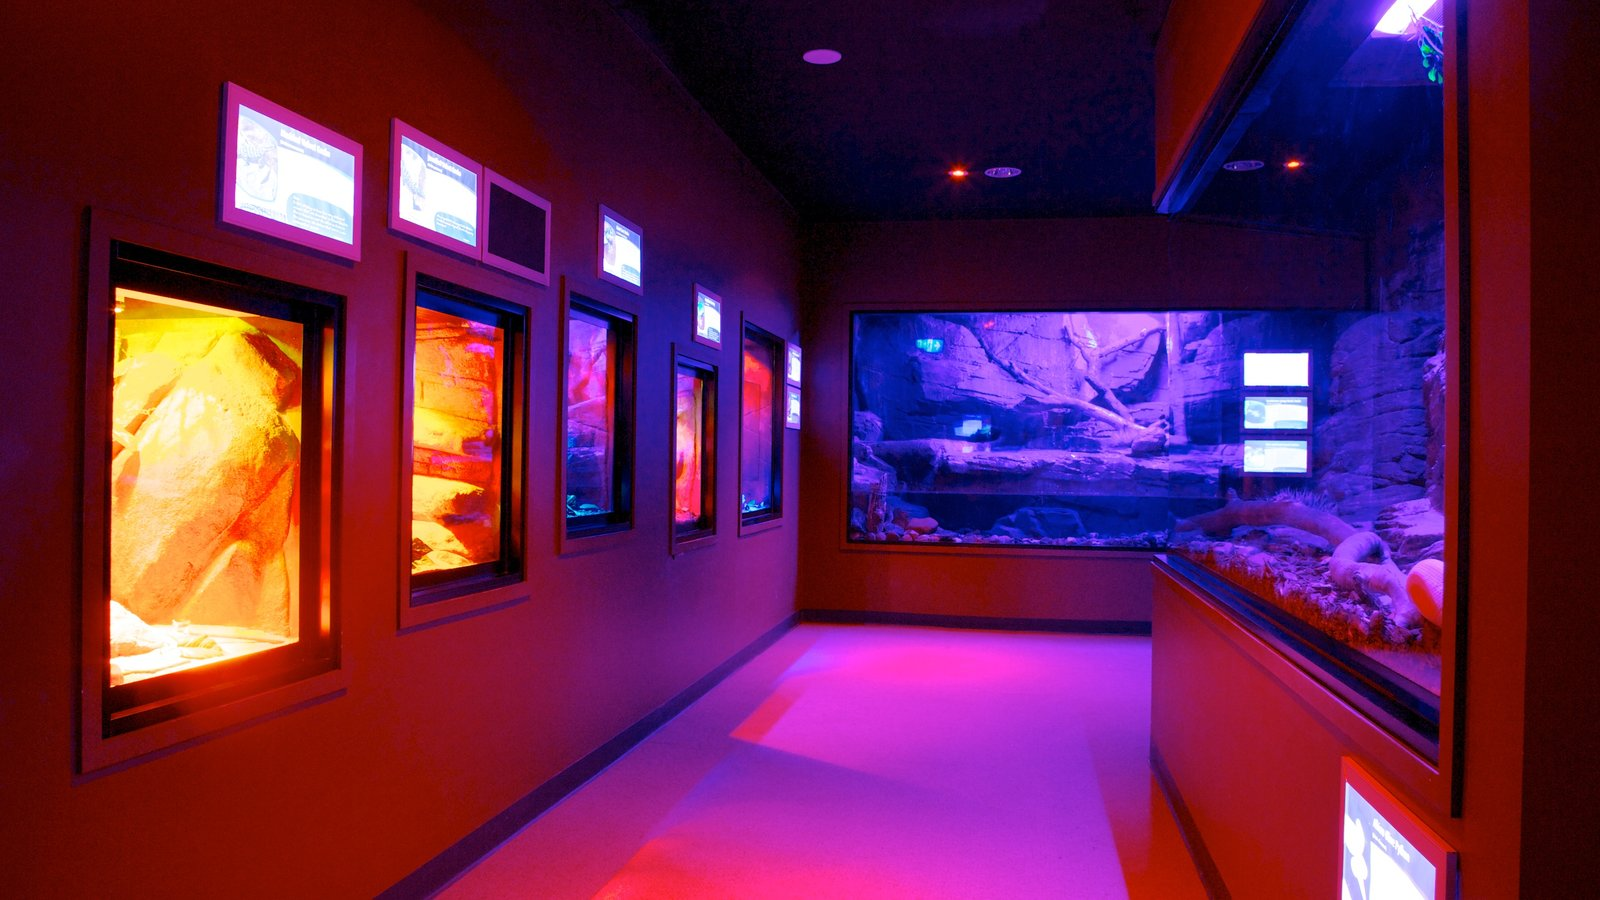 Crocosaurus Cove featuring interior views and marine life